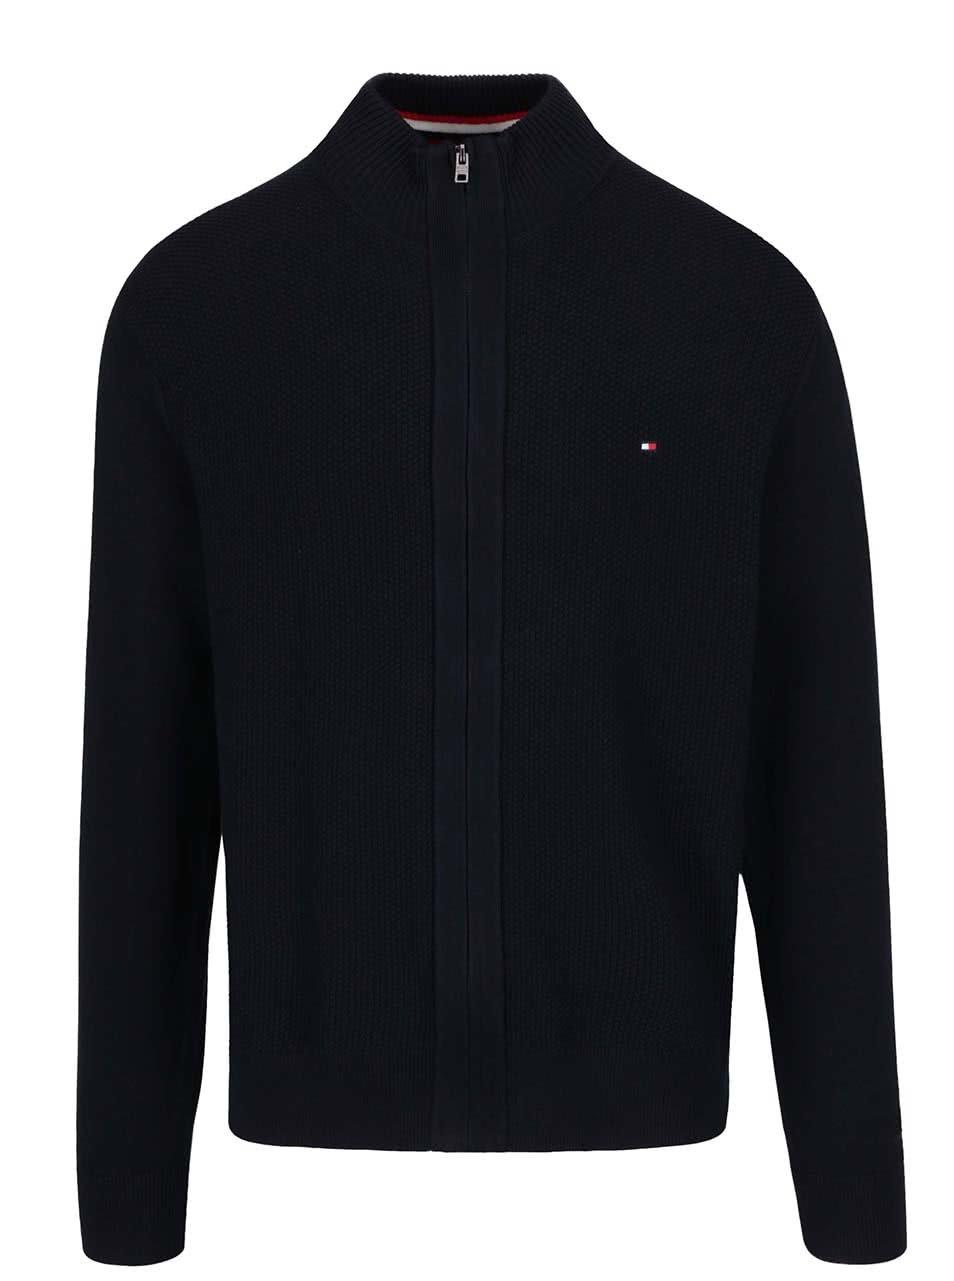 05761e77d37 Tmavě modrý pánský svetr na zip Tommy Hilfiger ...